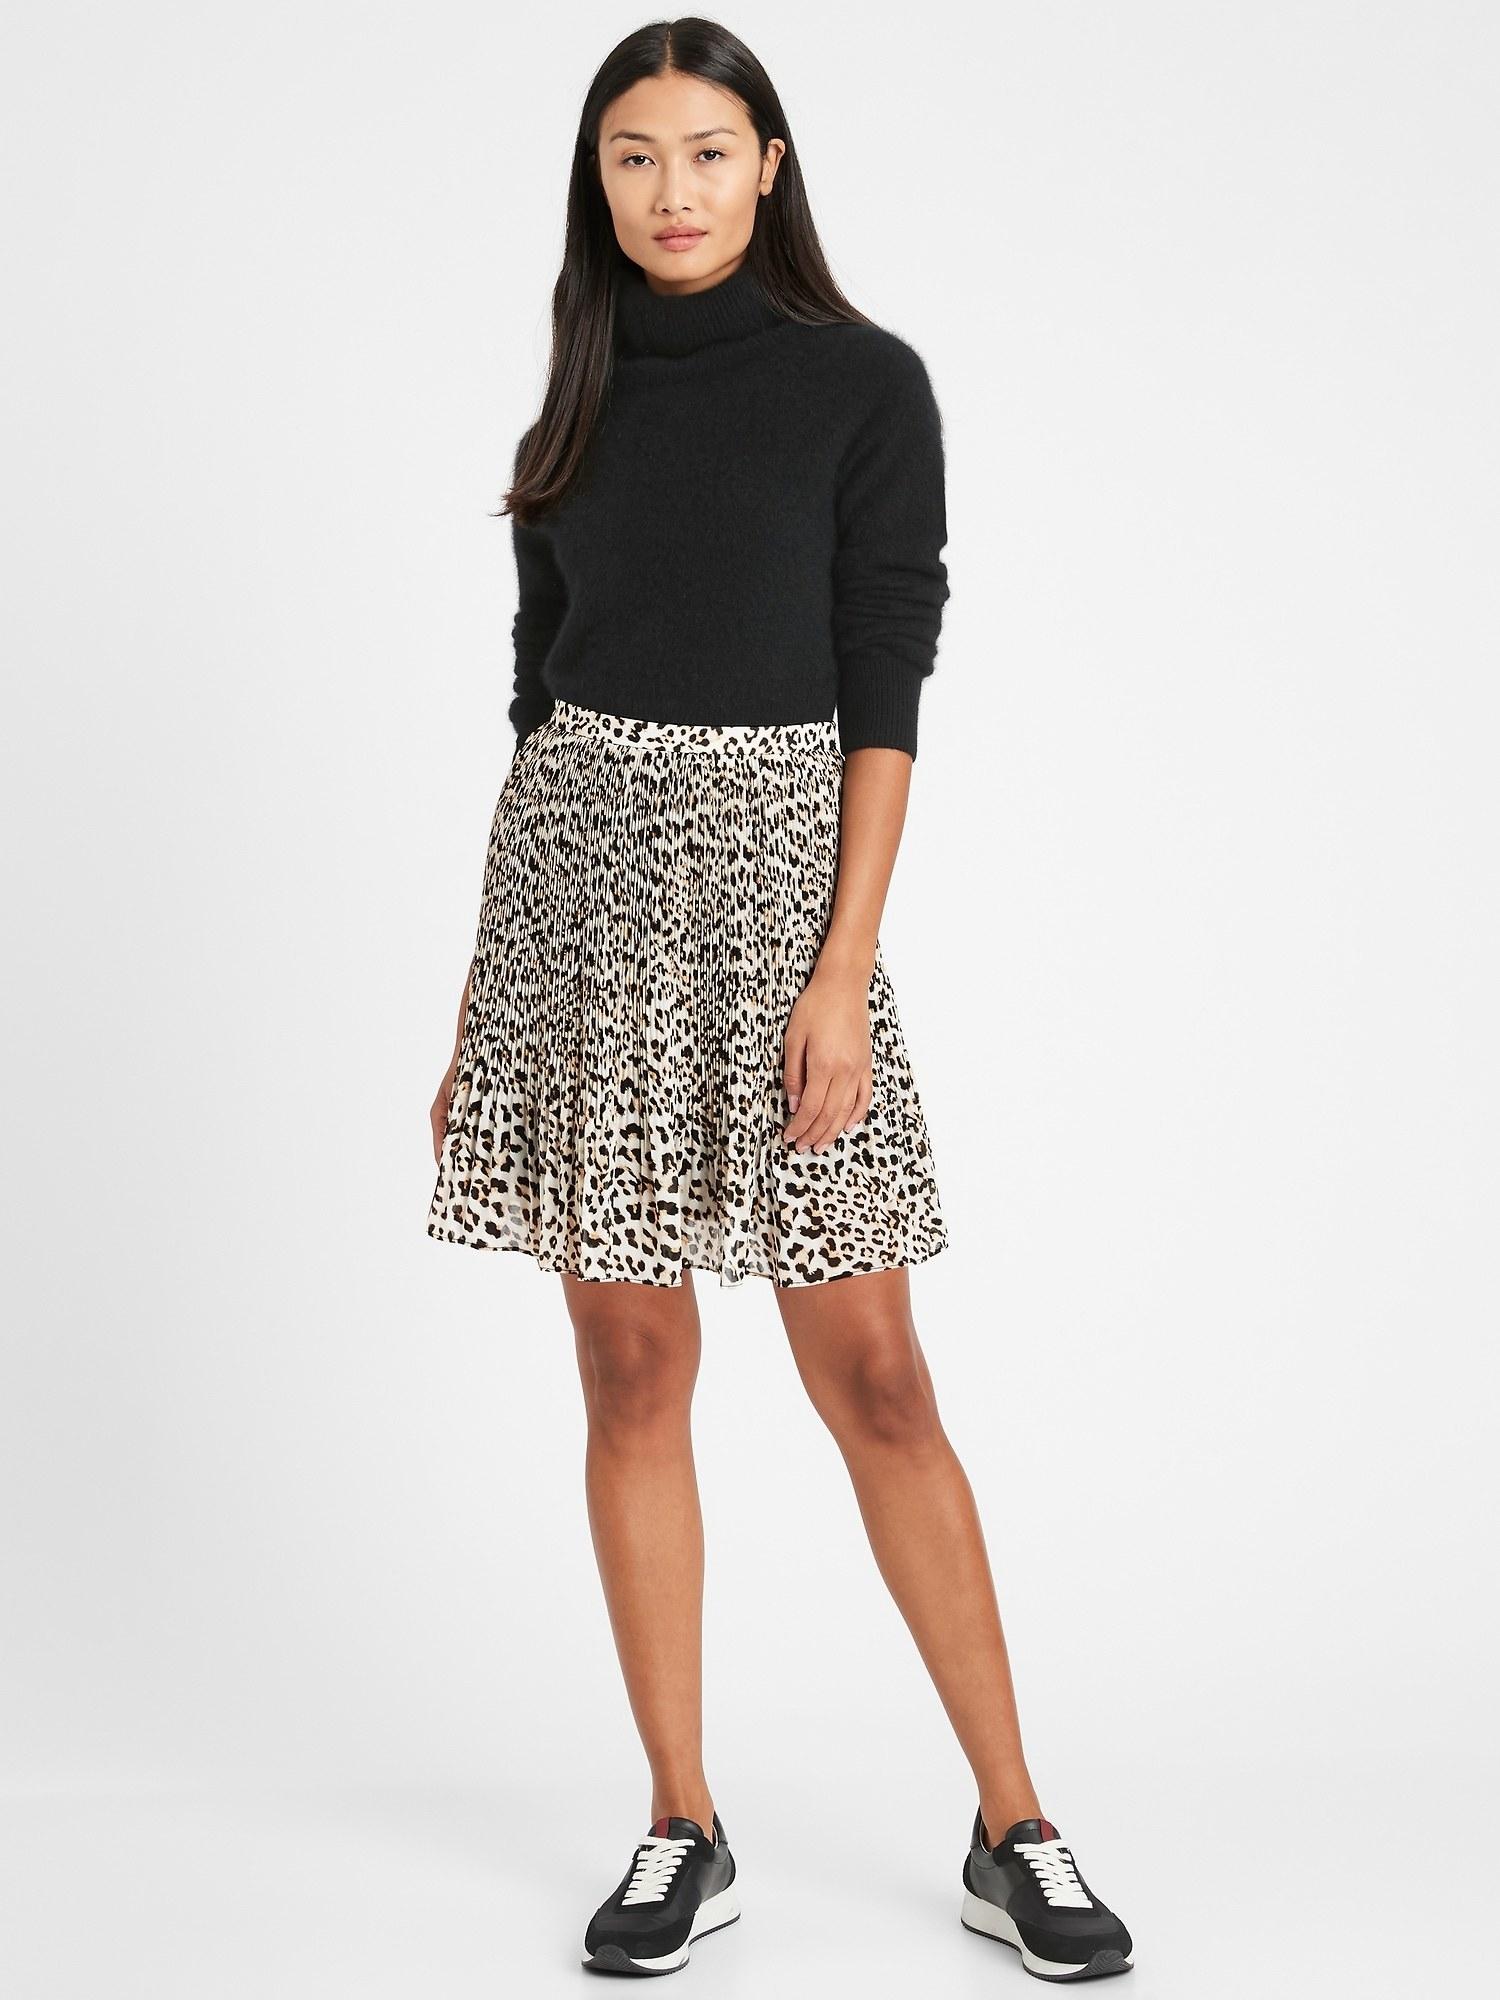 Model wearing the knee-length pleated skirt in leopard print